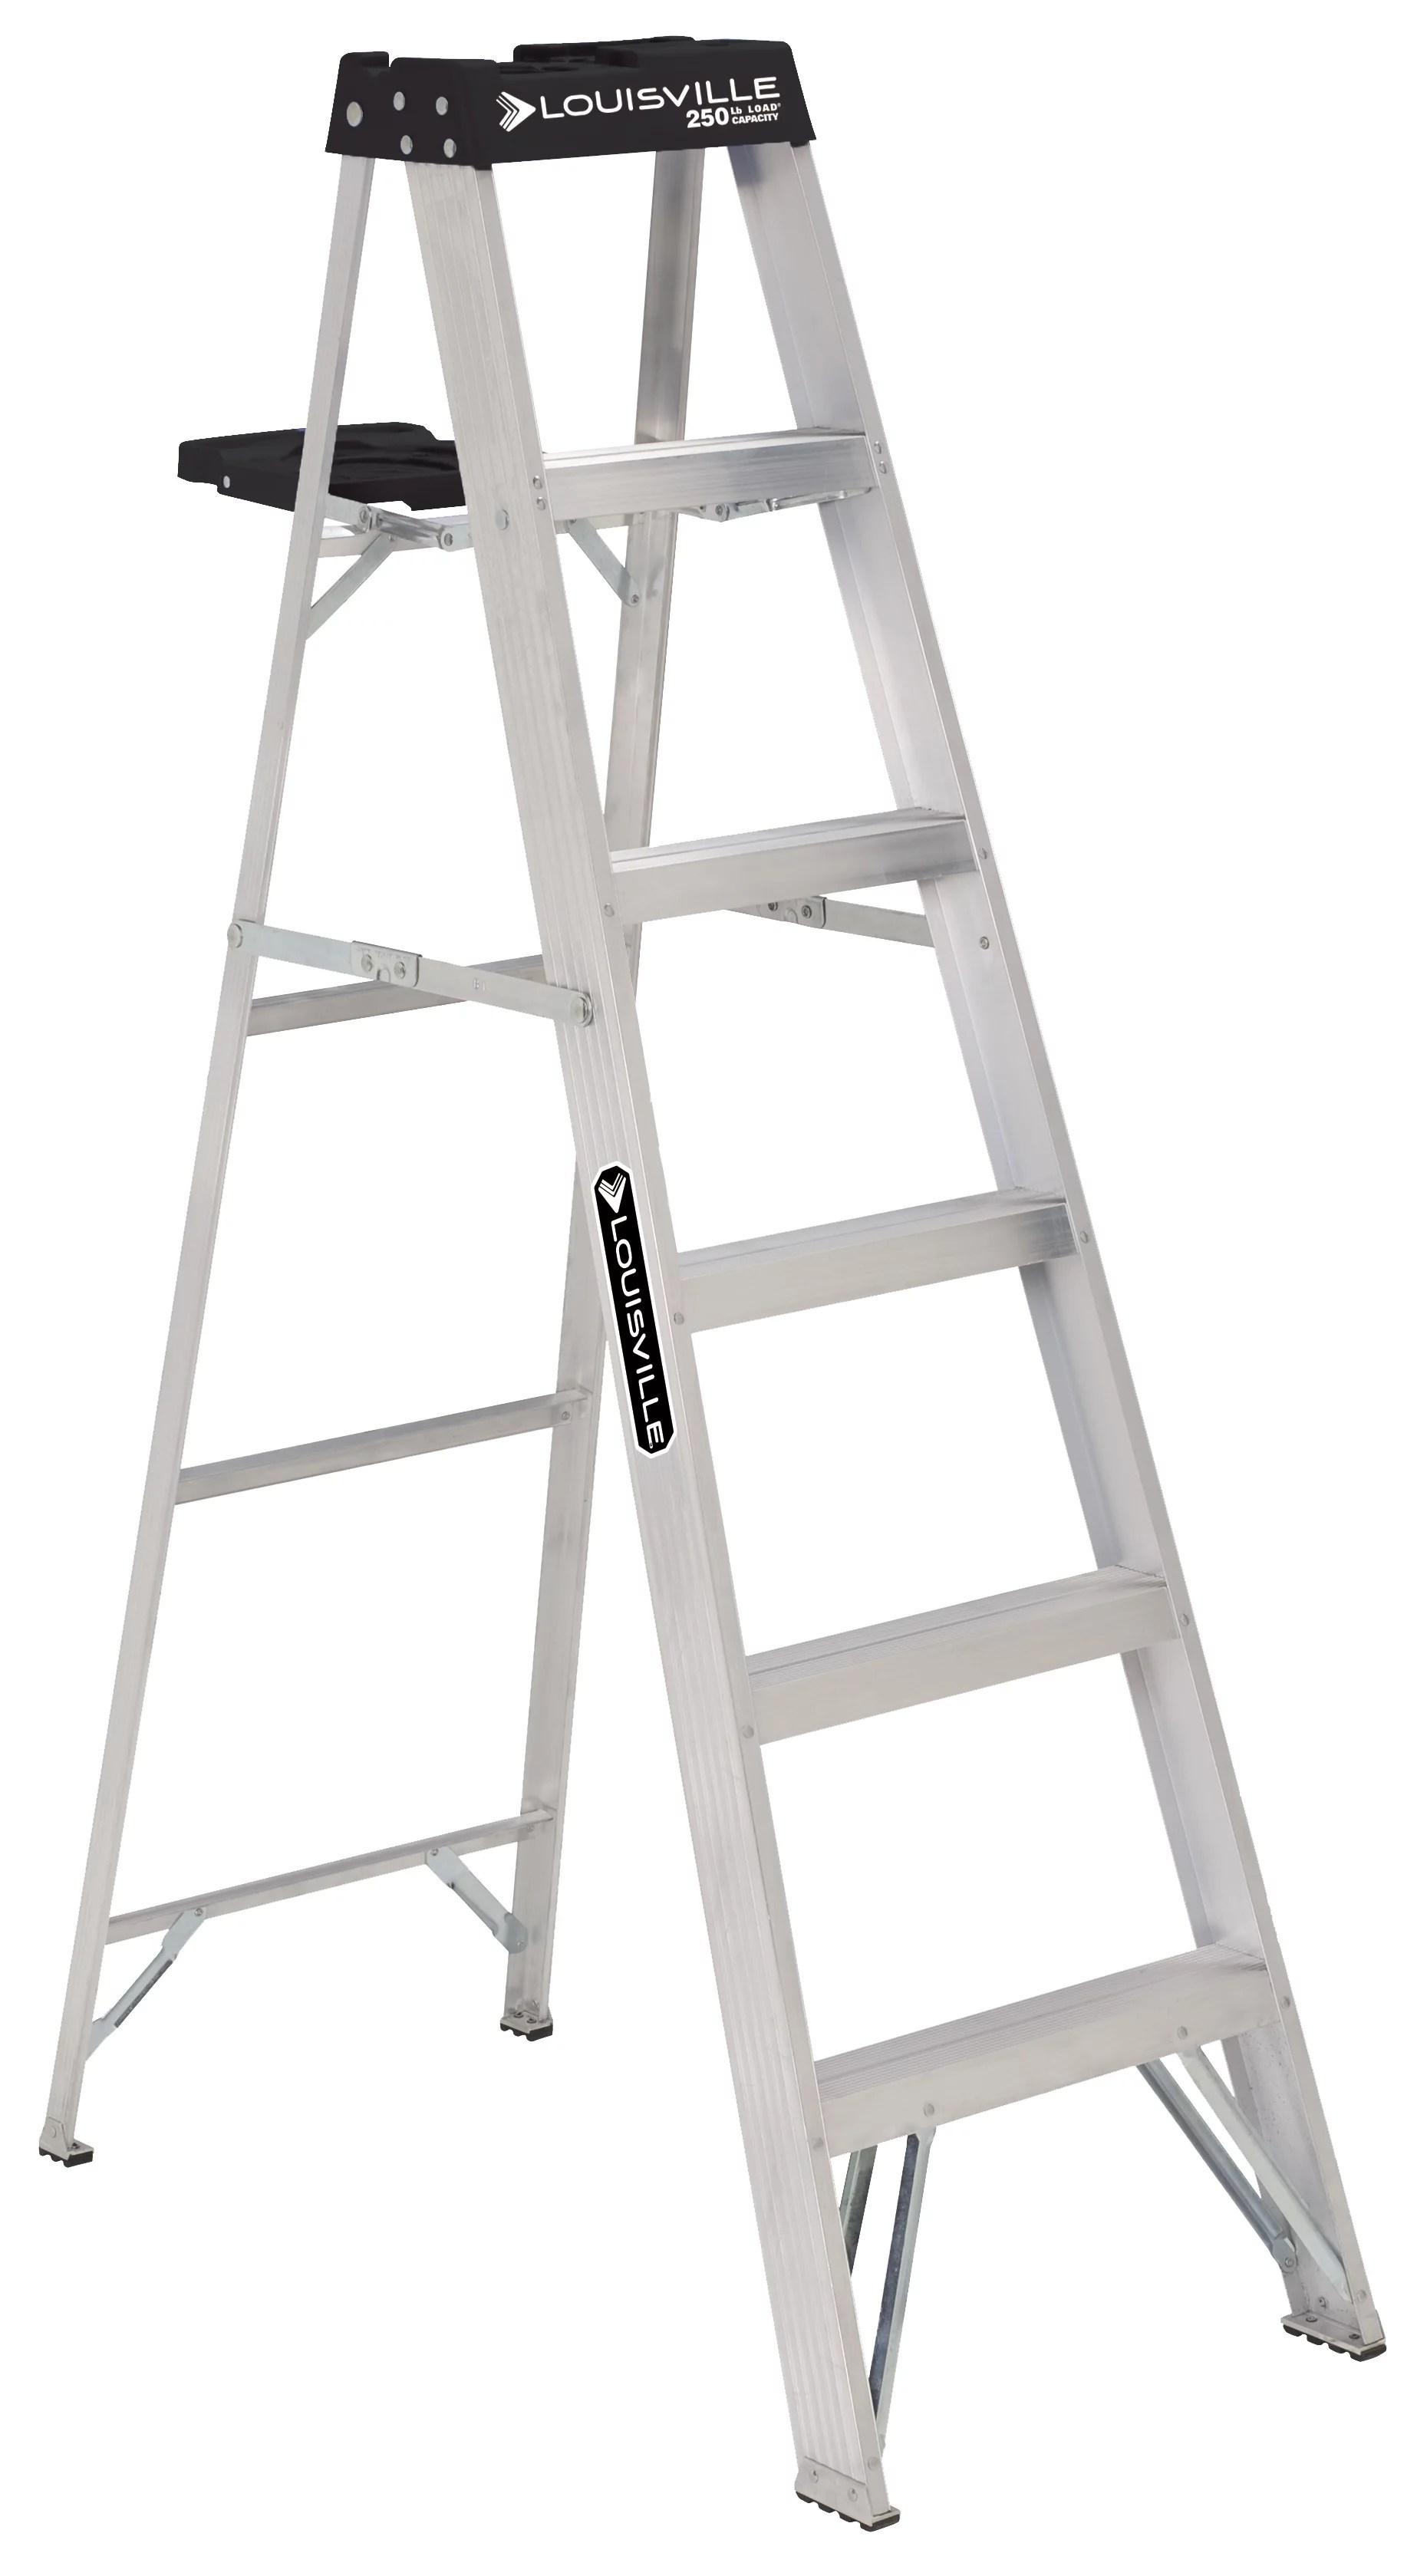 Louisville Ladder 6 Ft. Aluminum Stepladder, 250-Pound Capacity, Type I, W-2112-06S